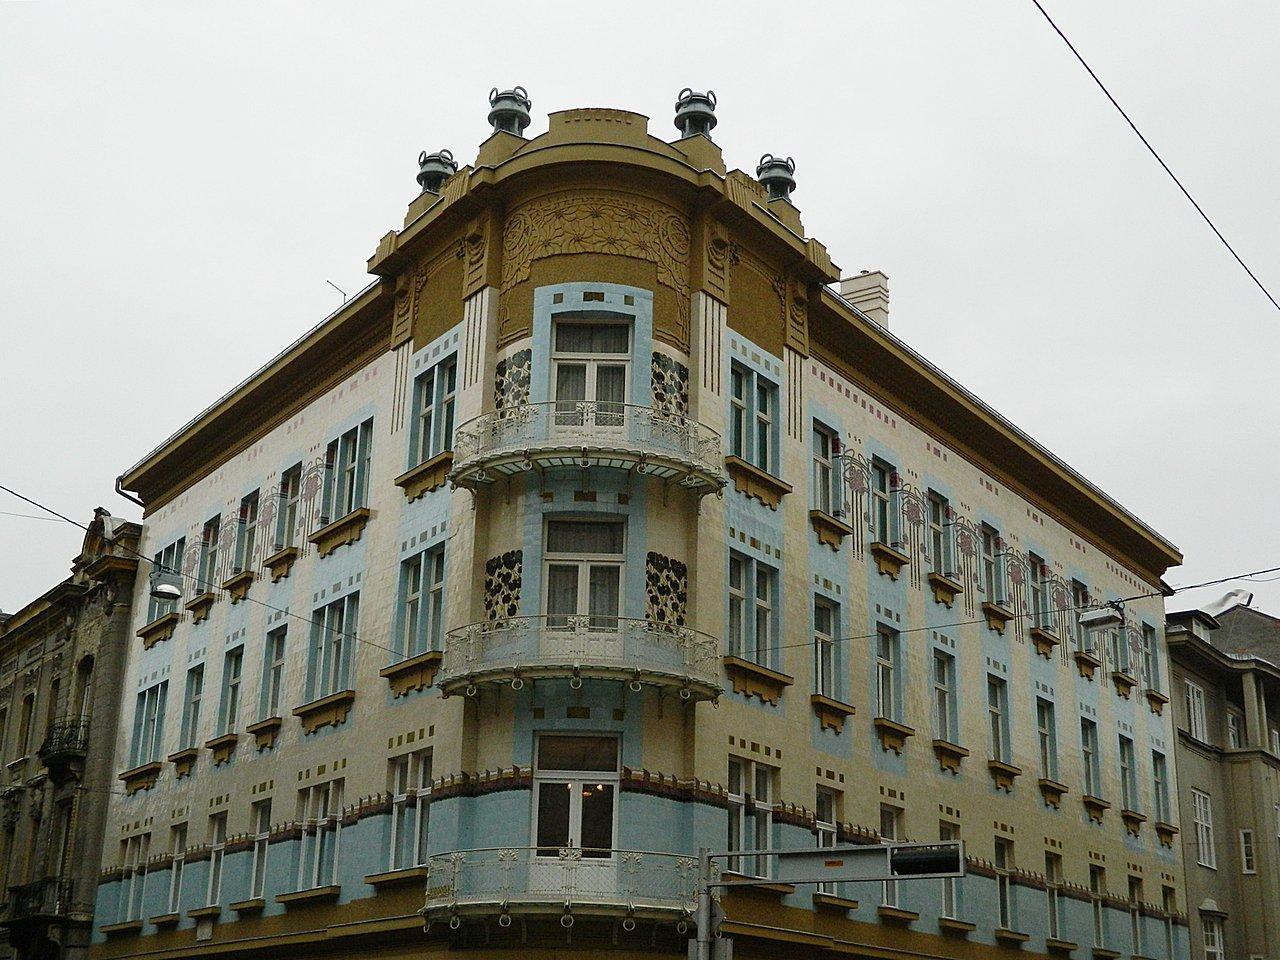 Kallina House Zagreb 2021 All You Need To Know Before You Go With Photos Tripadvisor